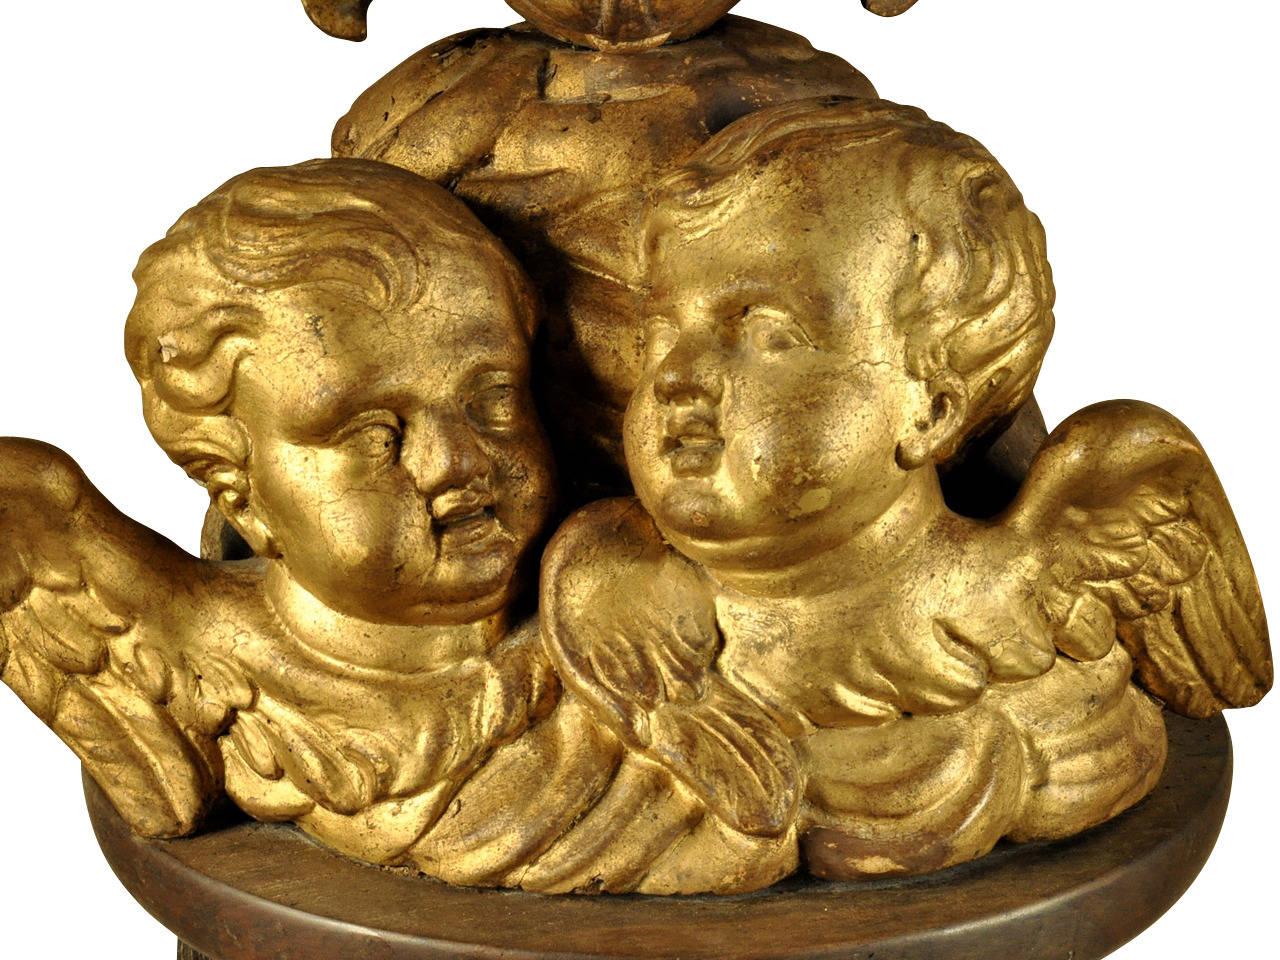 17th Century Italian Ecclesiastical Lectern In Good Condition For Sale In Atlanta, GA